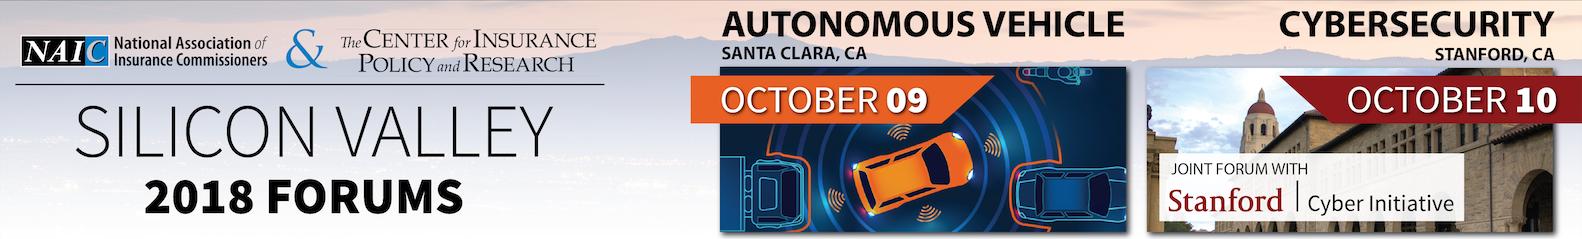 MTG-Autonomous Vehicle Insurance Forum & NAIC/Stanford University Joint Cybersecurity Forum